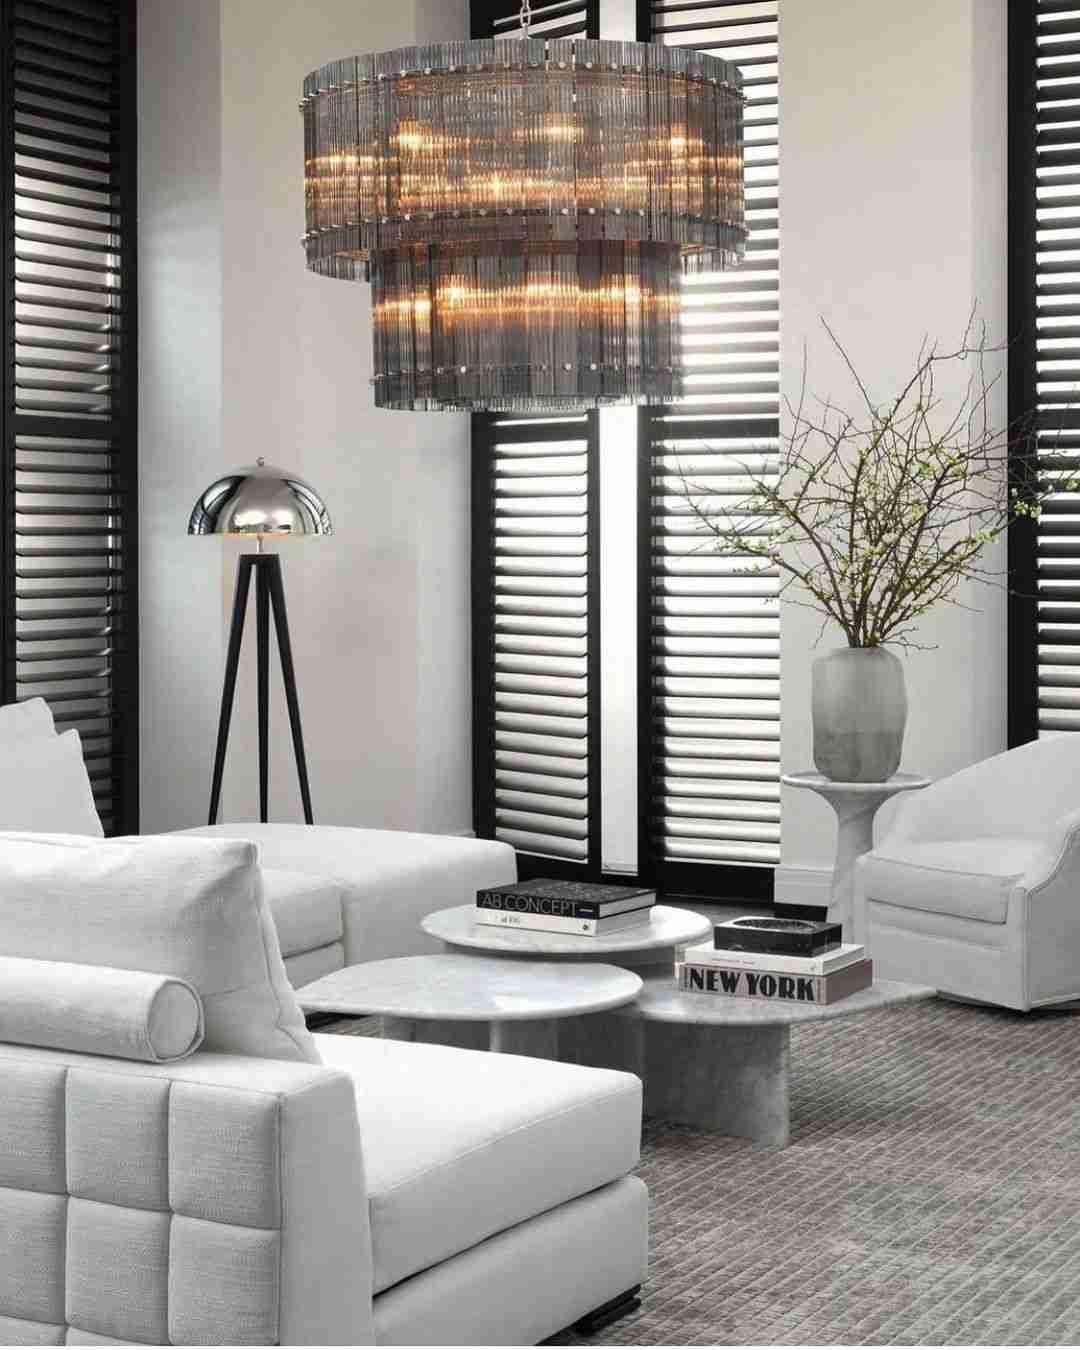 sofa, living room, dining room, andreotti, furniture, cyprus, limassol, epipla